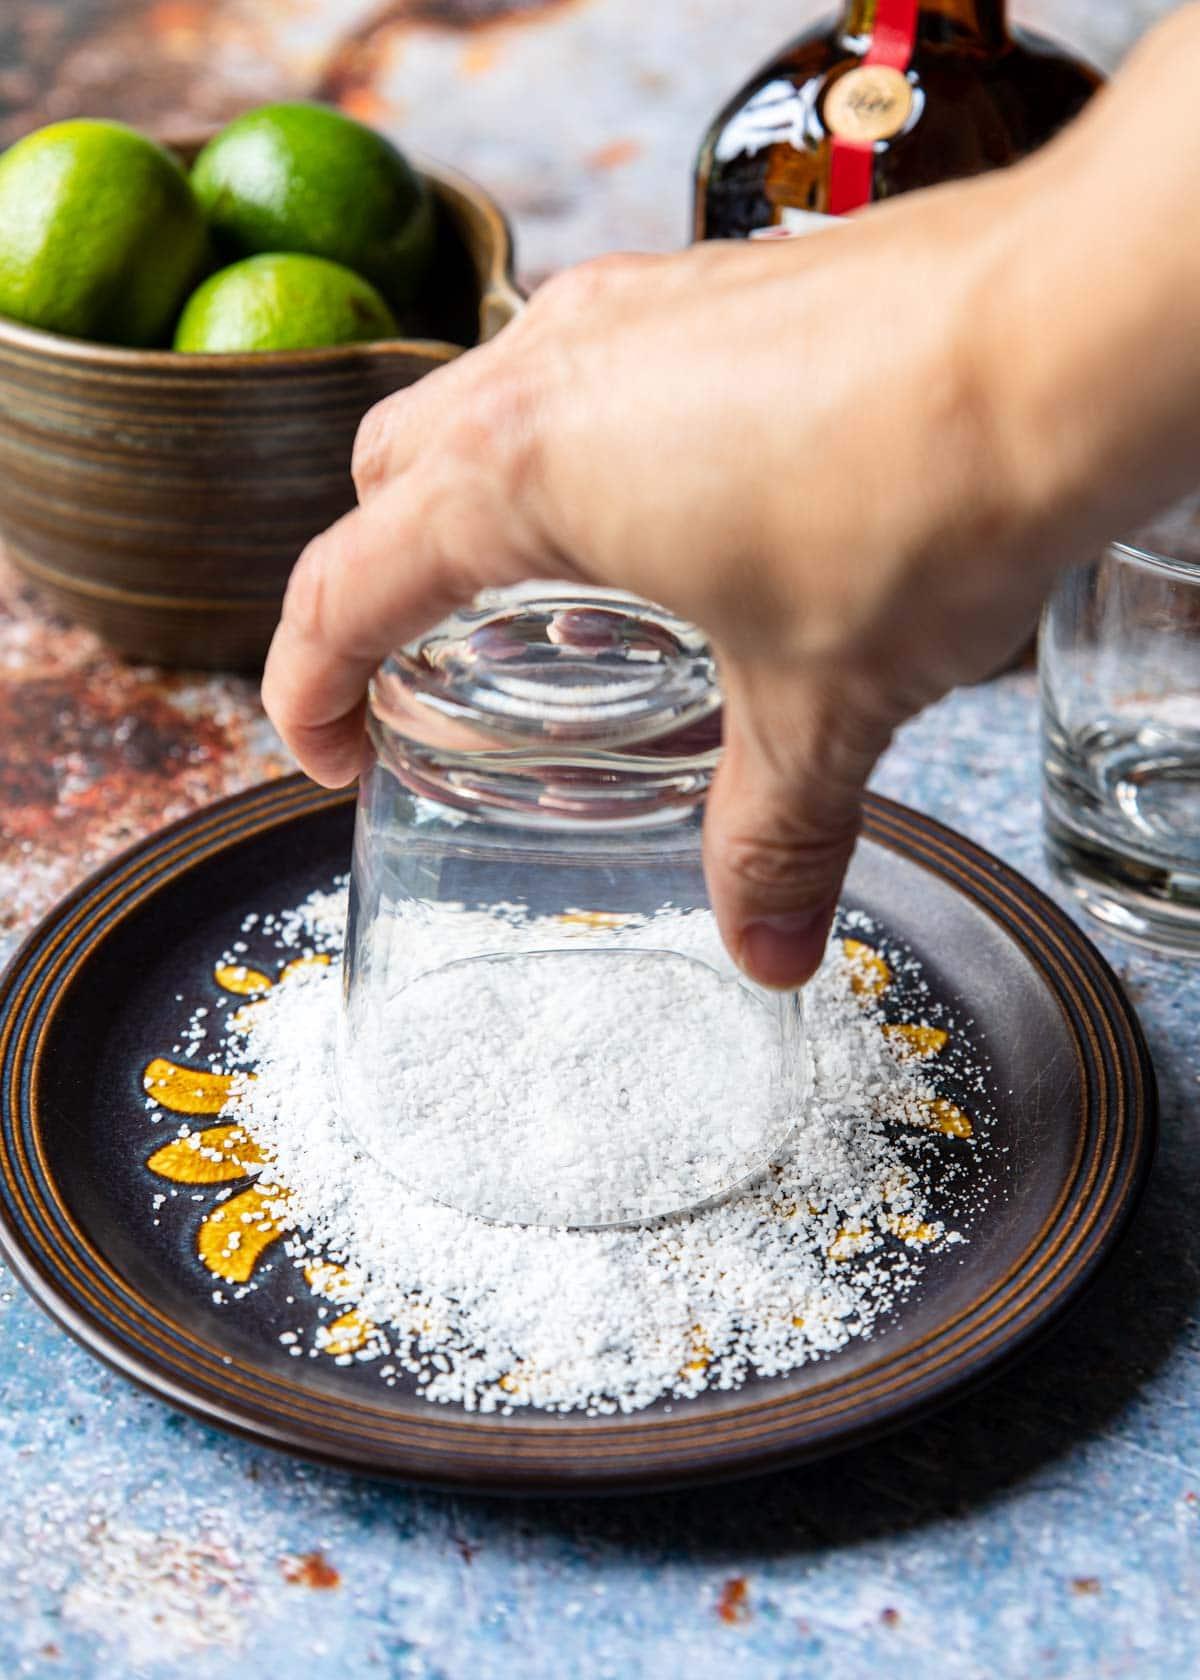 dipping a glass rim in kosher salt